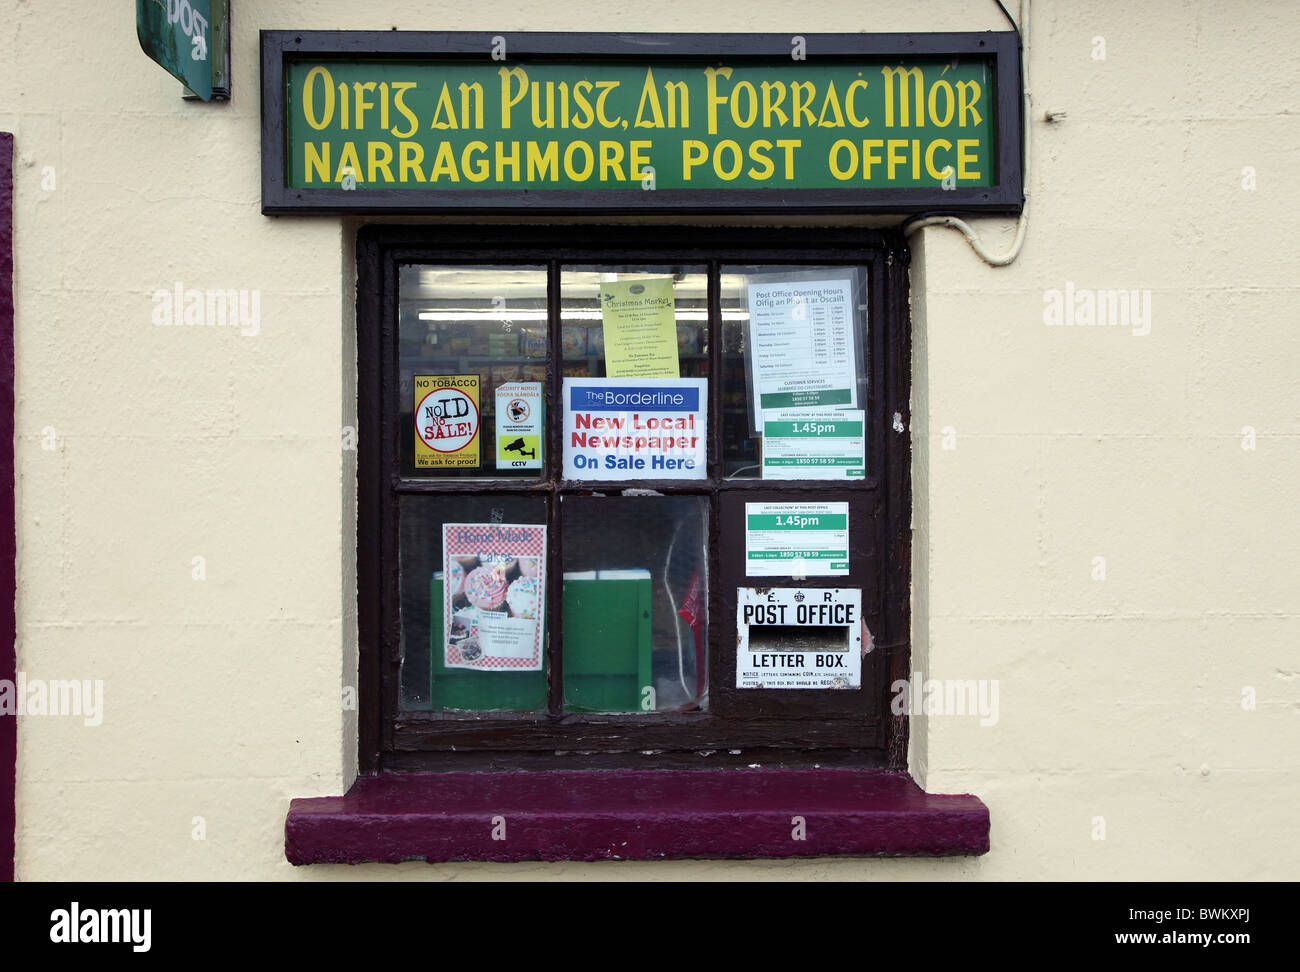 Narraghmore Post Office, Co. Kildare, Ireland - Stock Image